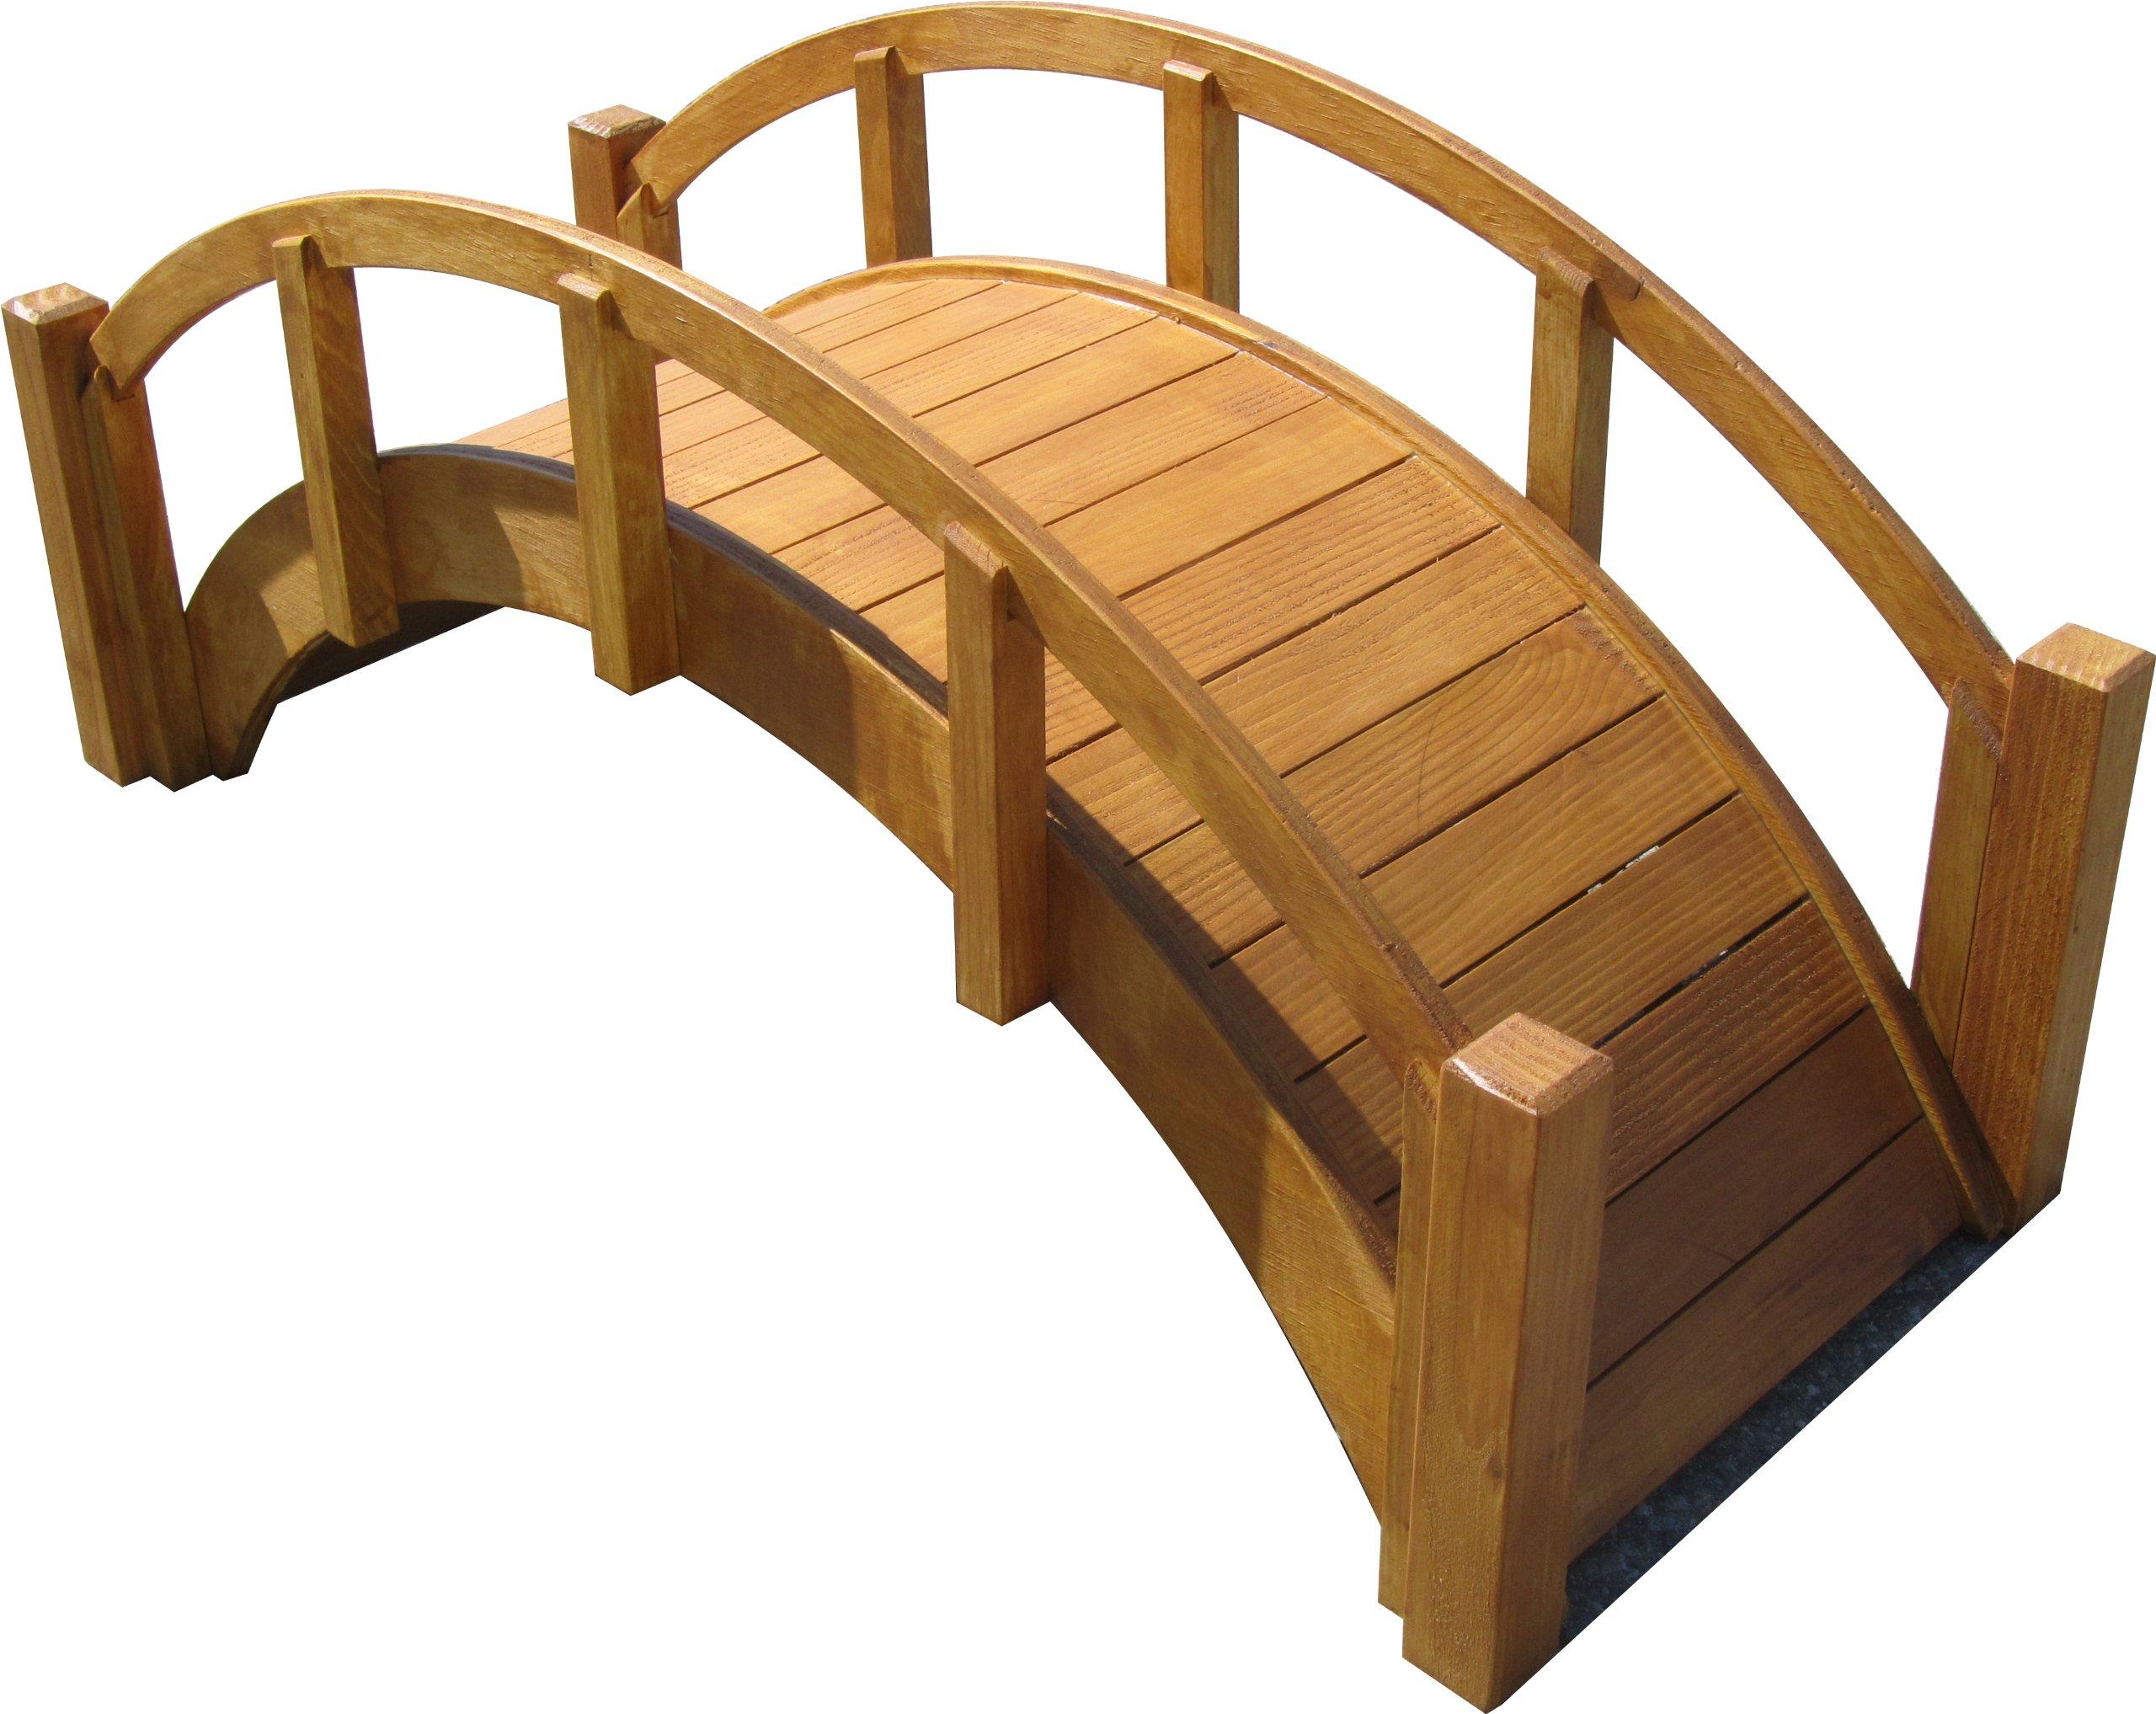 SamsGazebos Miniature Japanese Waterproof Wood Garden Bridge, 29-Inch, Tan